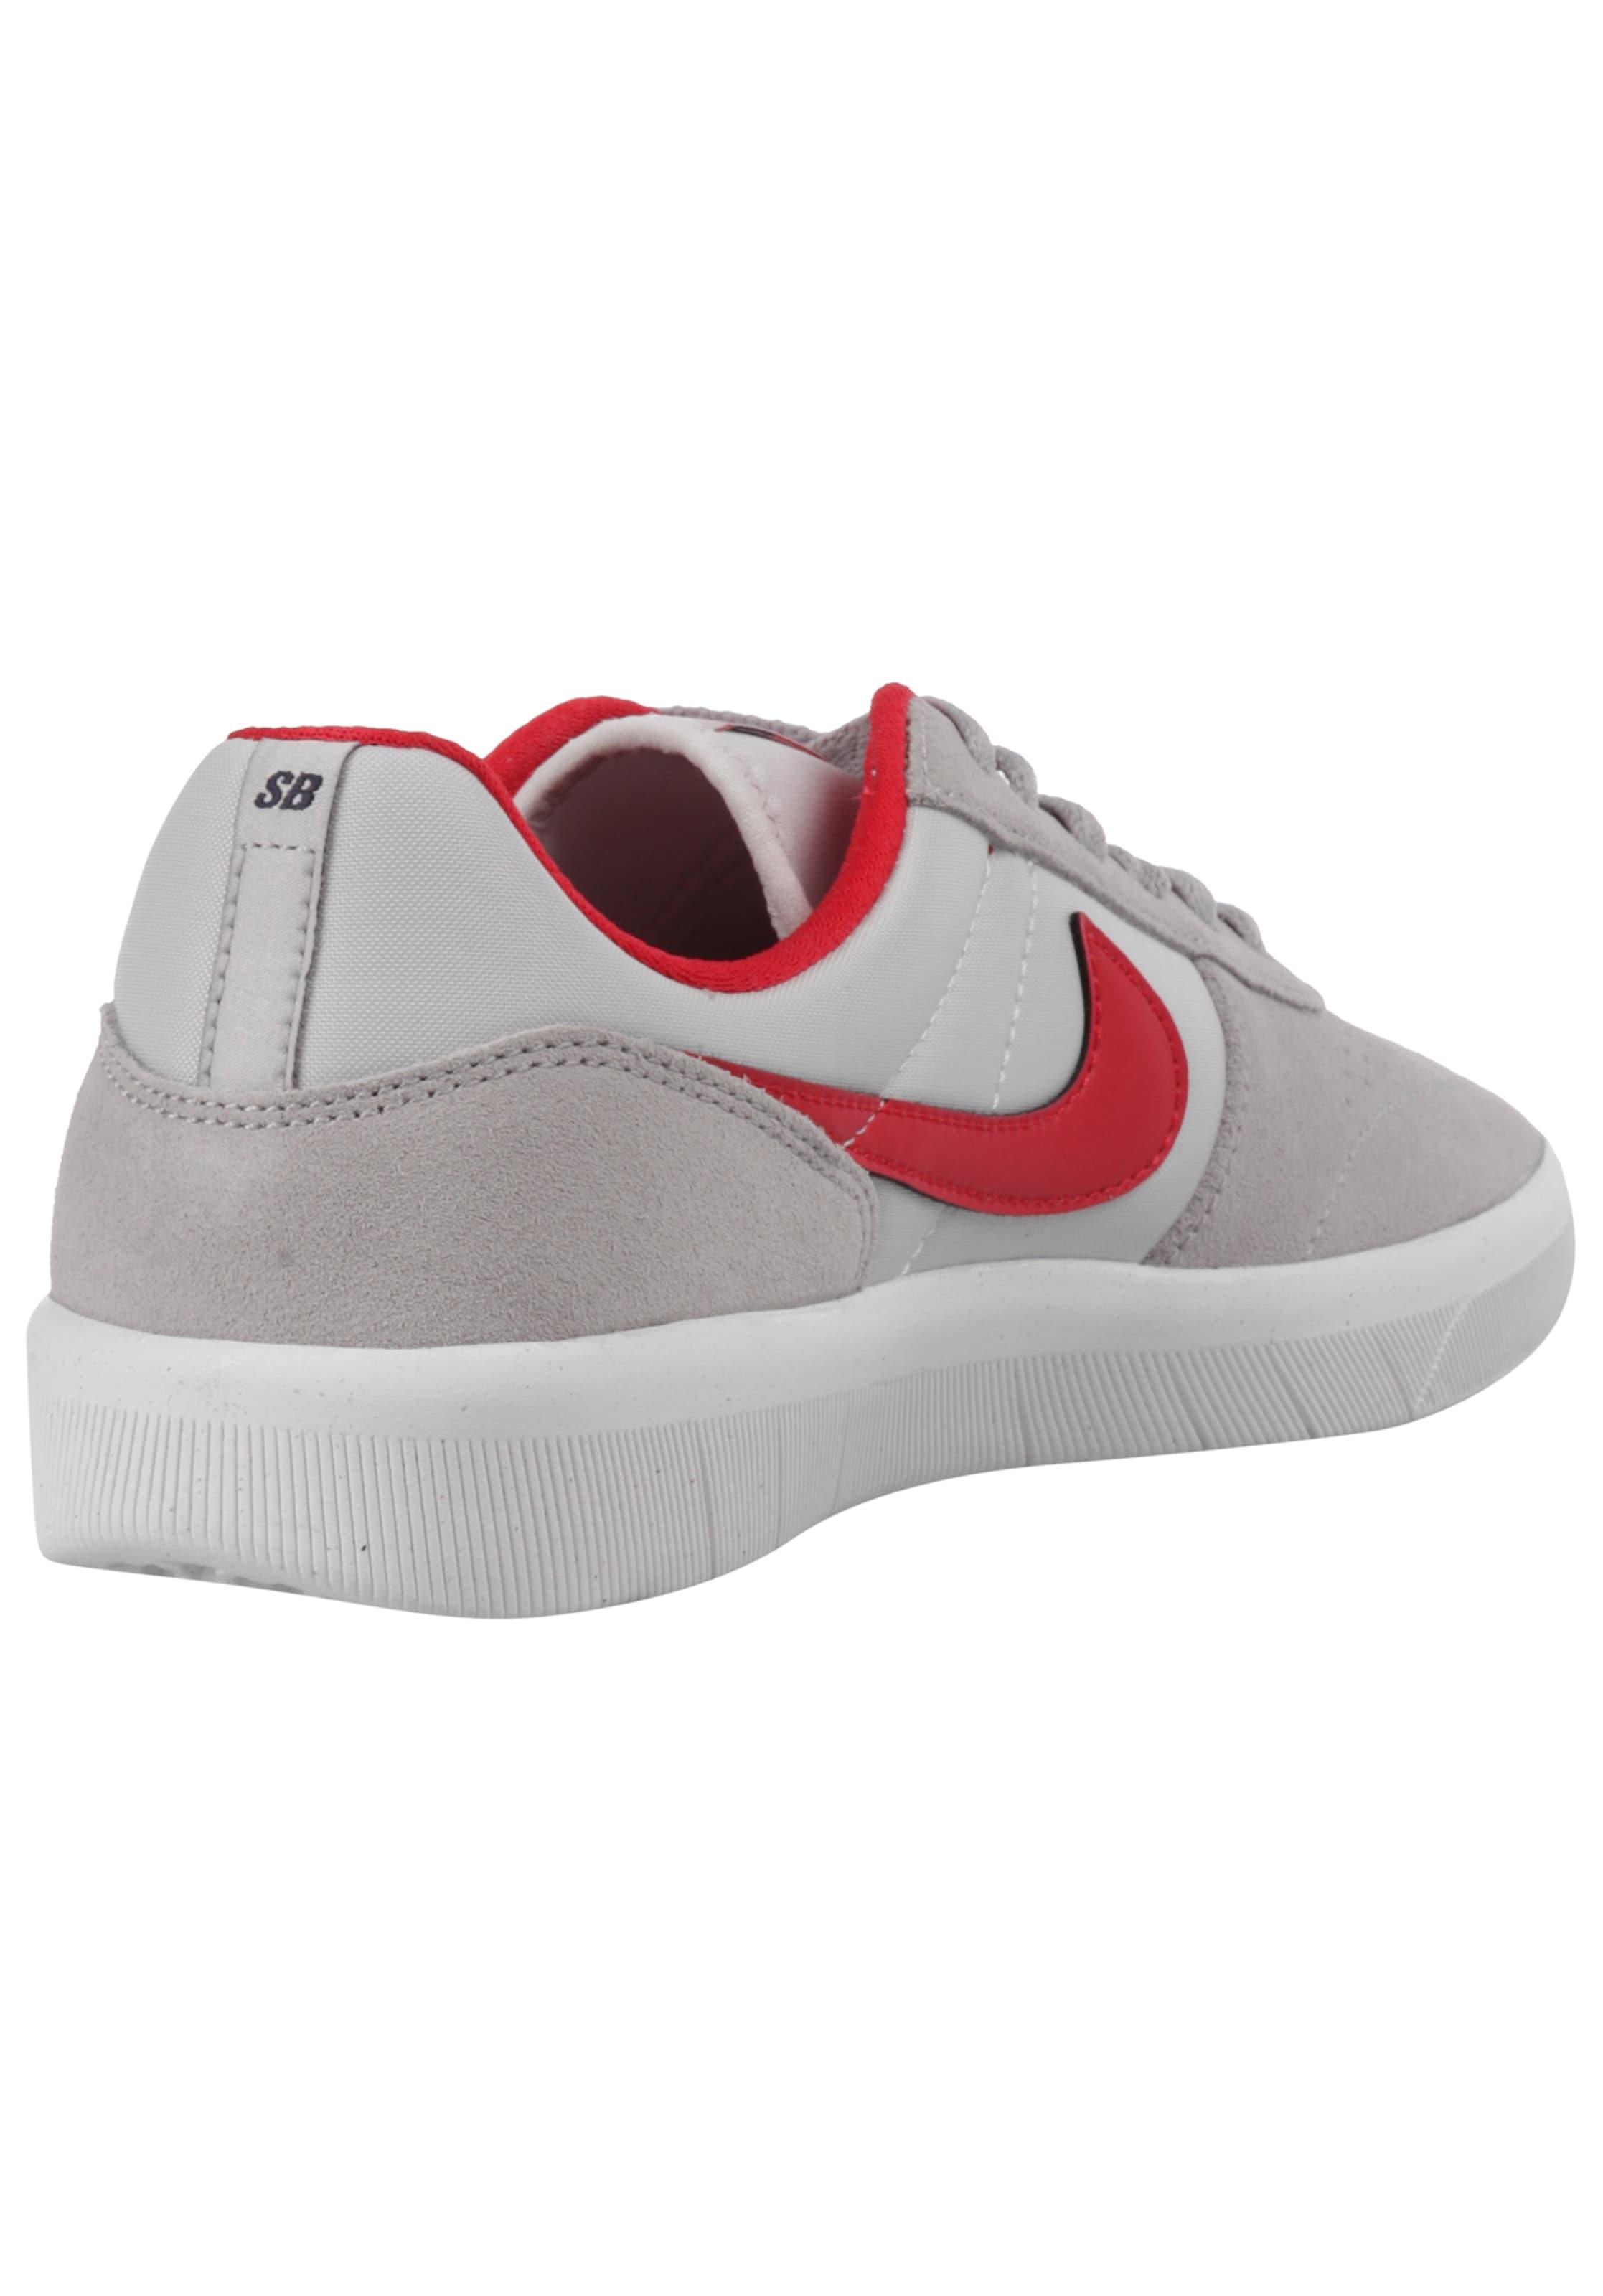 Sneaker Classic' 'team GrauHellgrau Rot Nike In Sb QxhrotBdsC